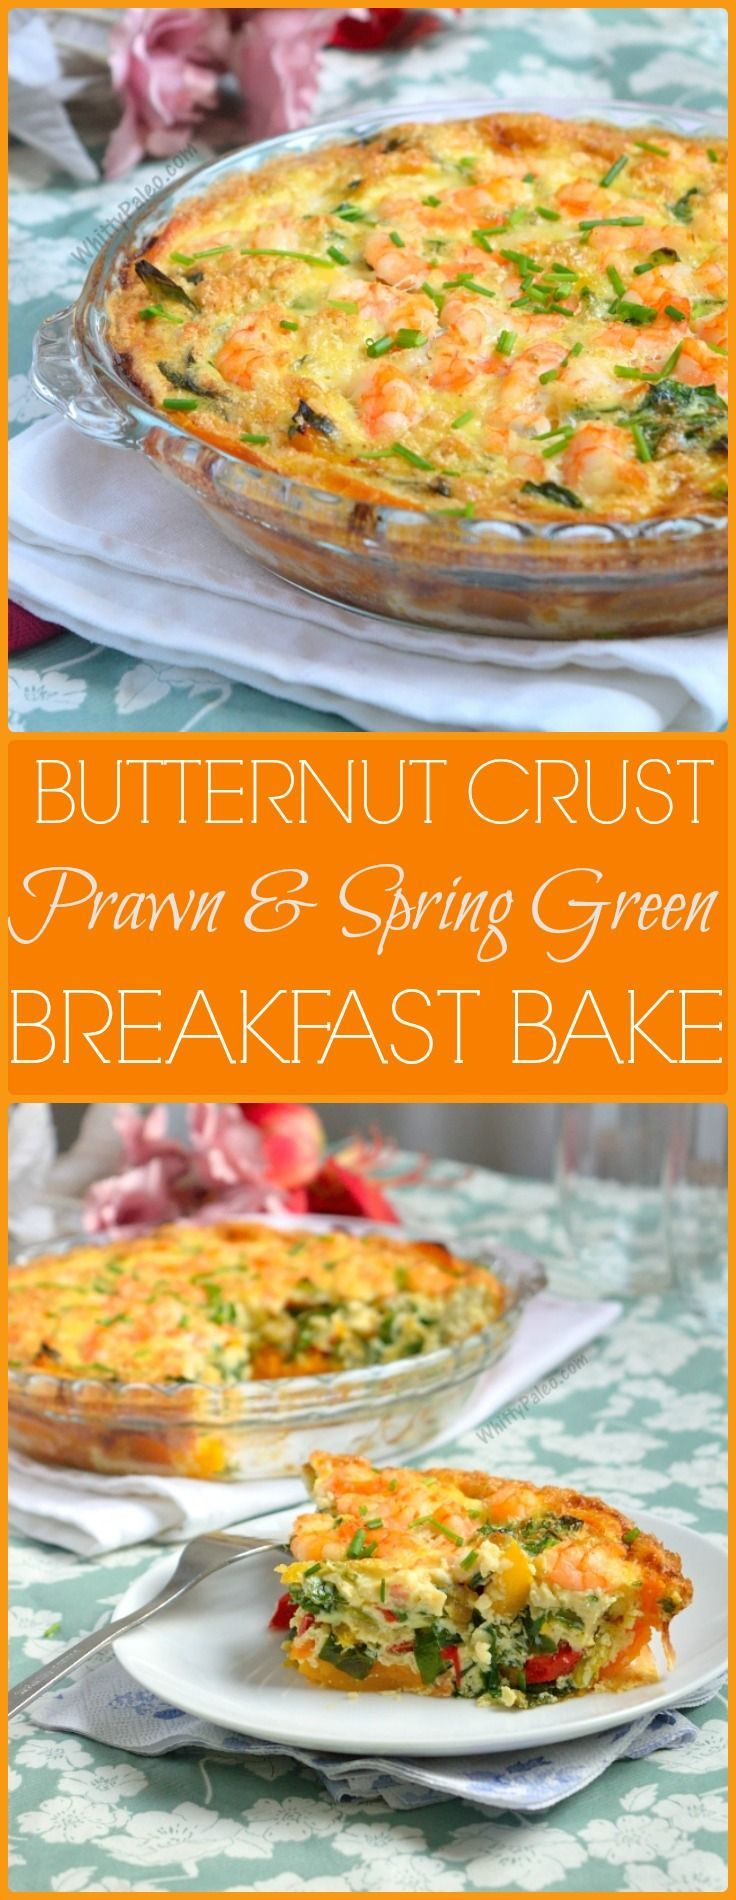 Butternut Crust Prawn Spring Green Breakfast Bake - Paleo, Gluten Free recipe from http://WhittyPaleo.com